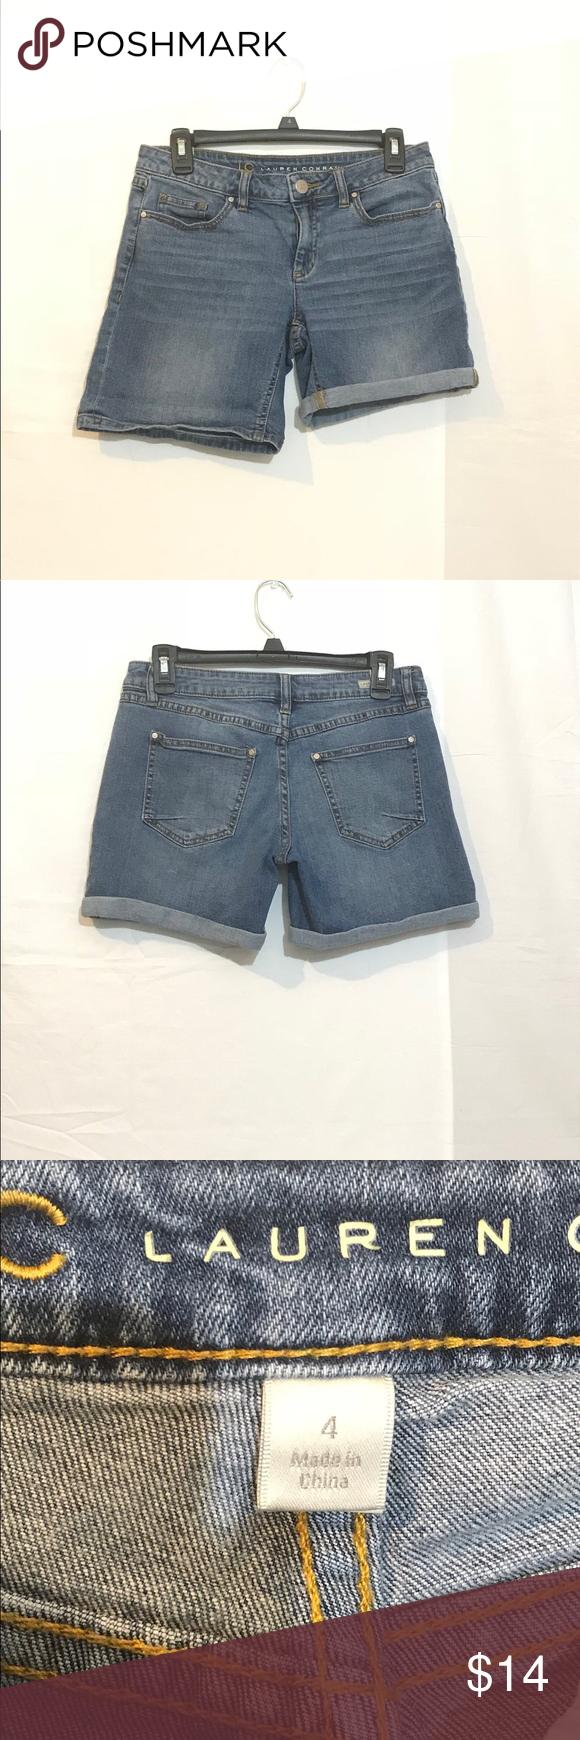 "Lauren Conrad 4.5"" Denim Roll Tab Shorts Fashion"